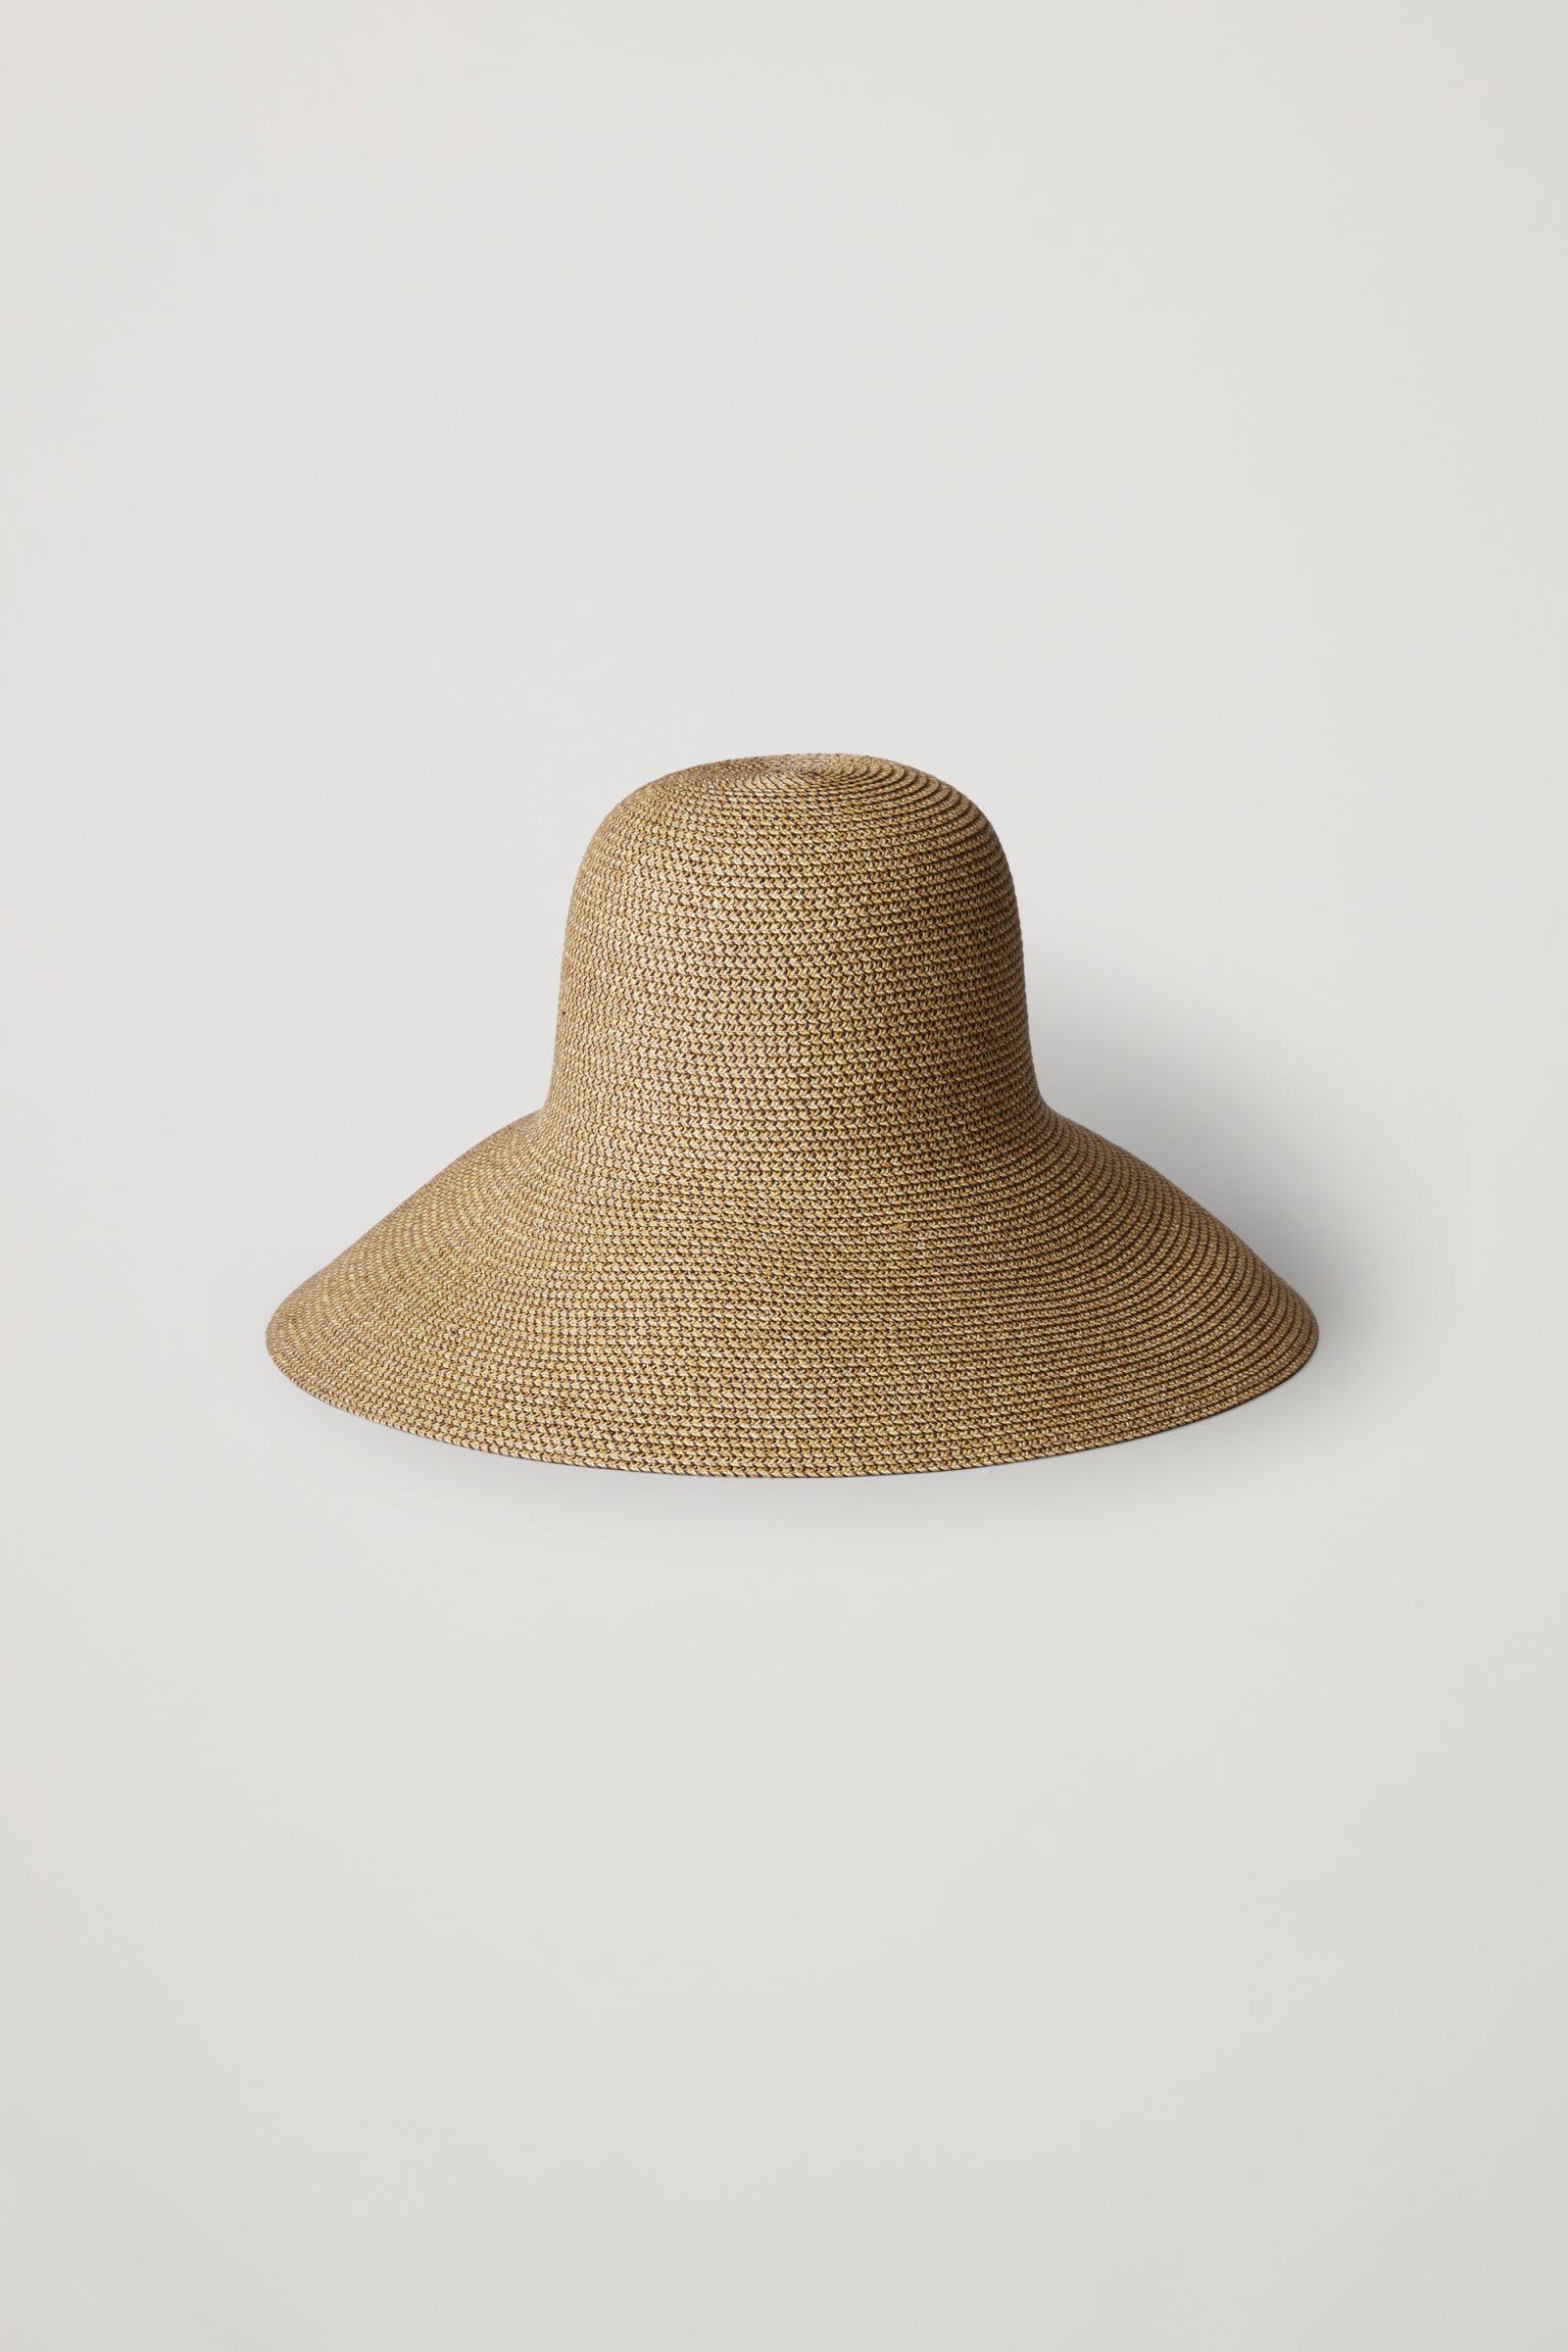 aea24b545 COS | Wide-brim straw hat | Minimal Women's Fashion in 2019 | Hats ...